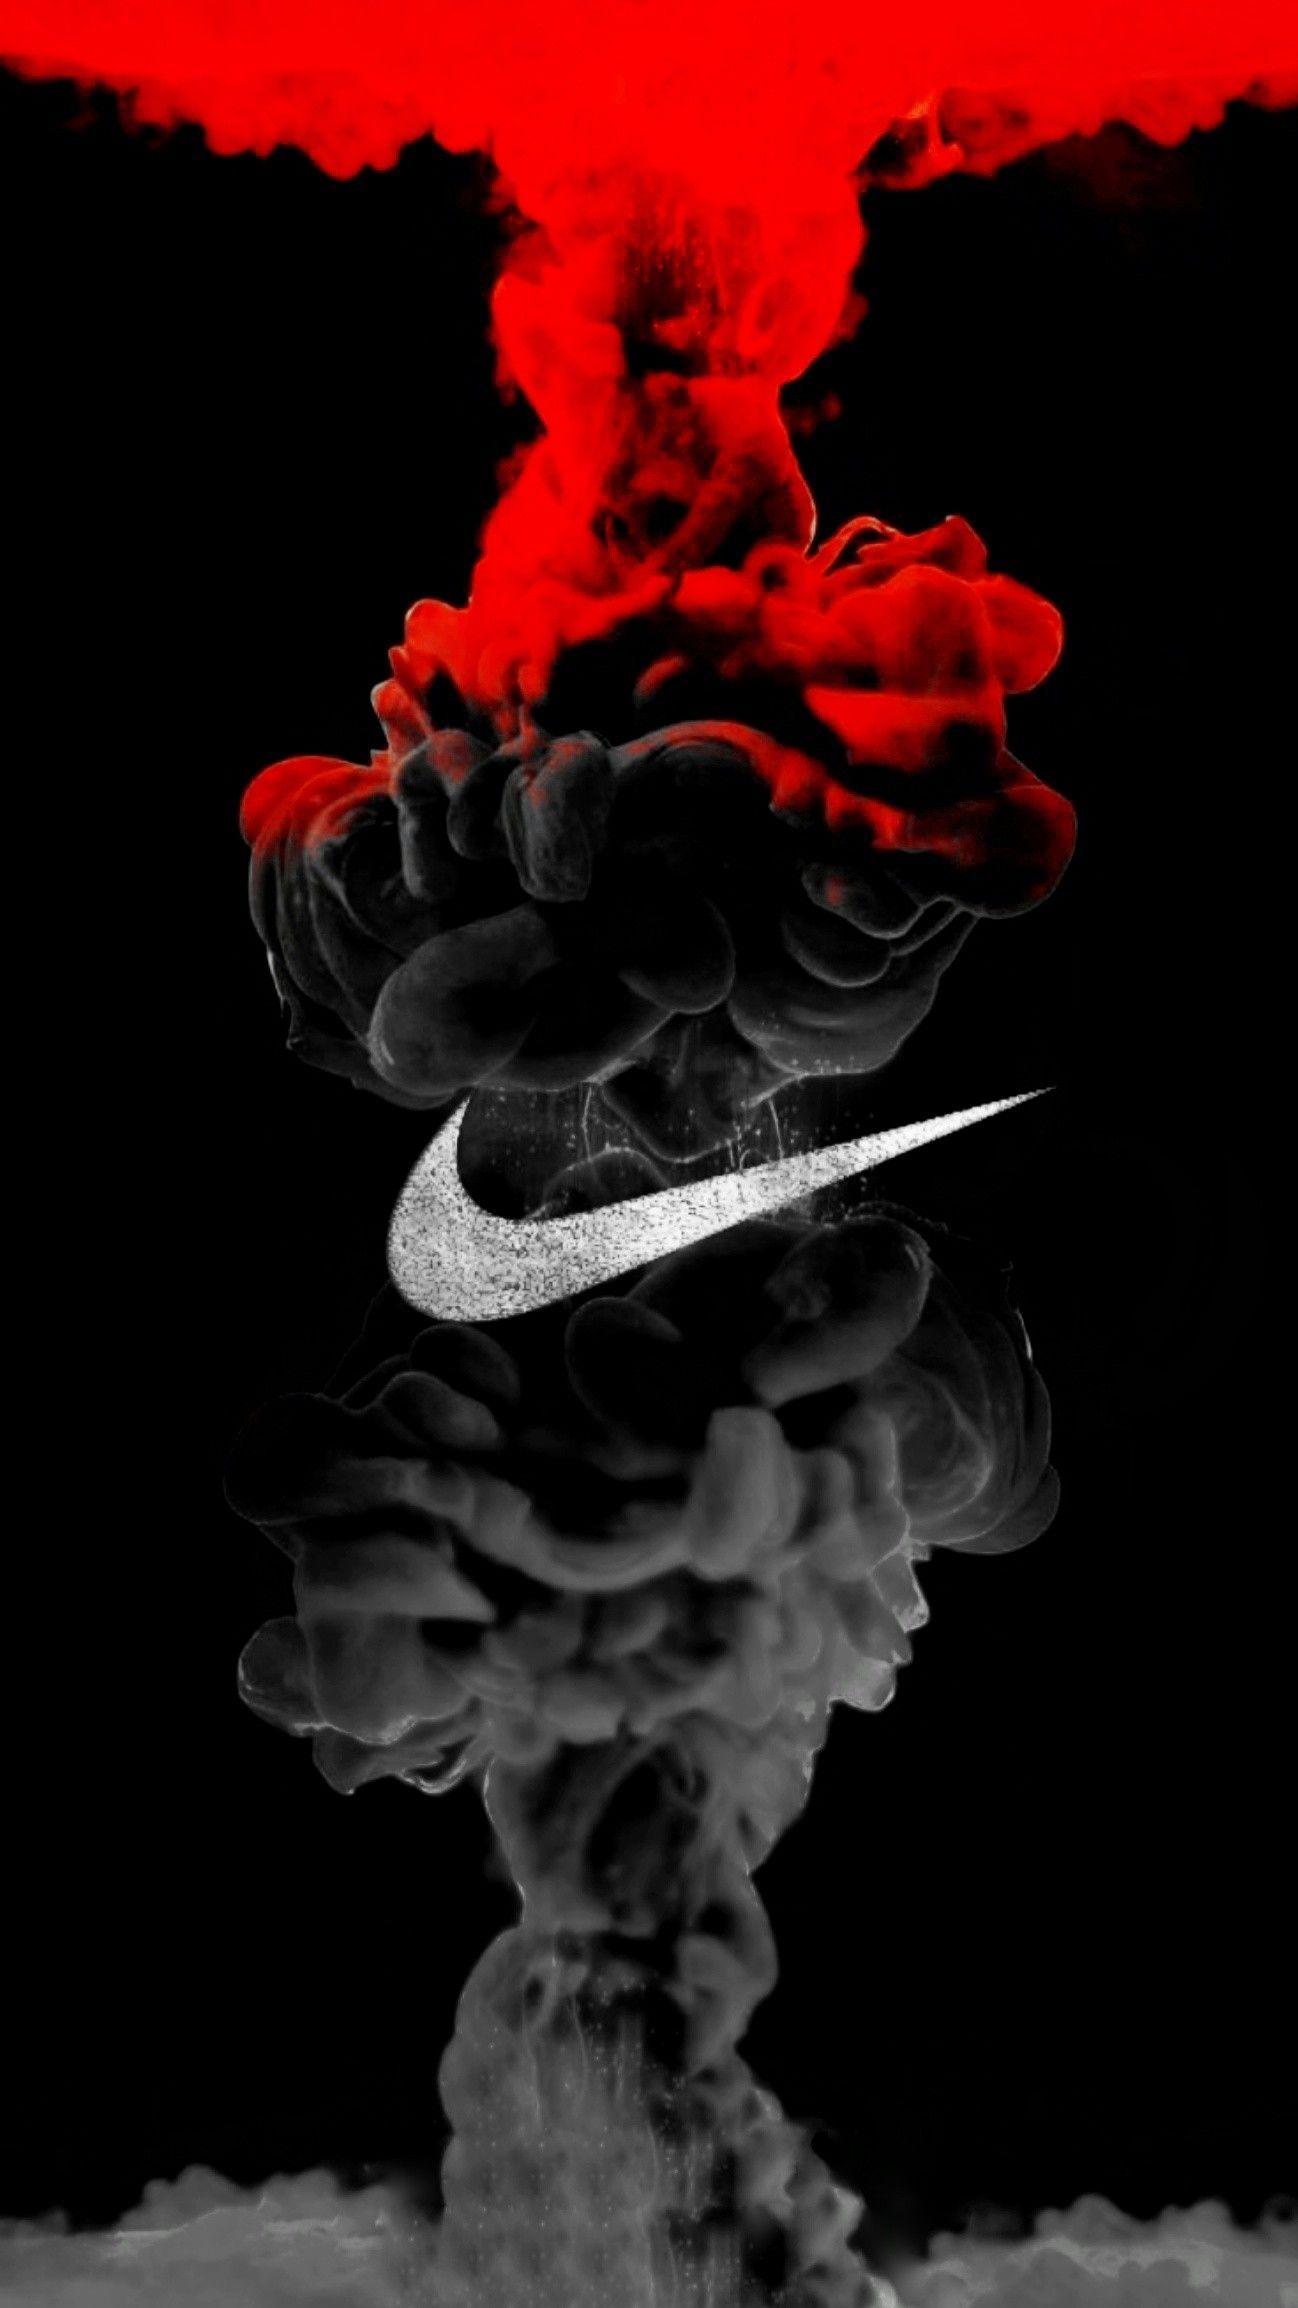 Nike Wallpapers In 2020 Adidas Iphone Wallpaper Nike Wallpaper Hypebeast Wallpaper